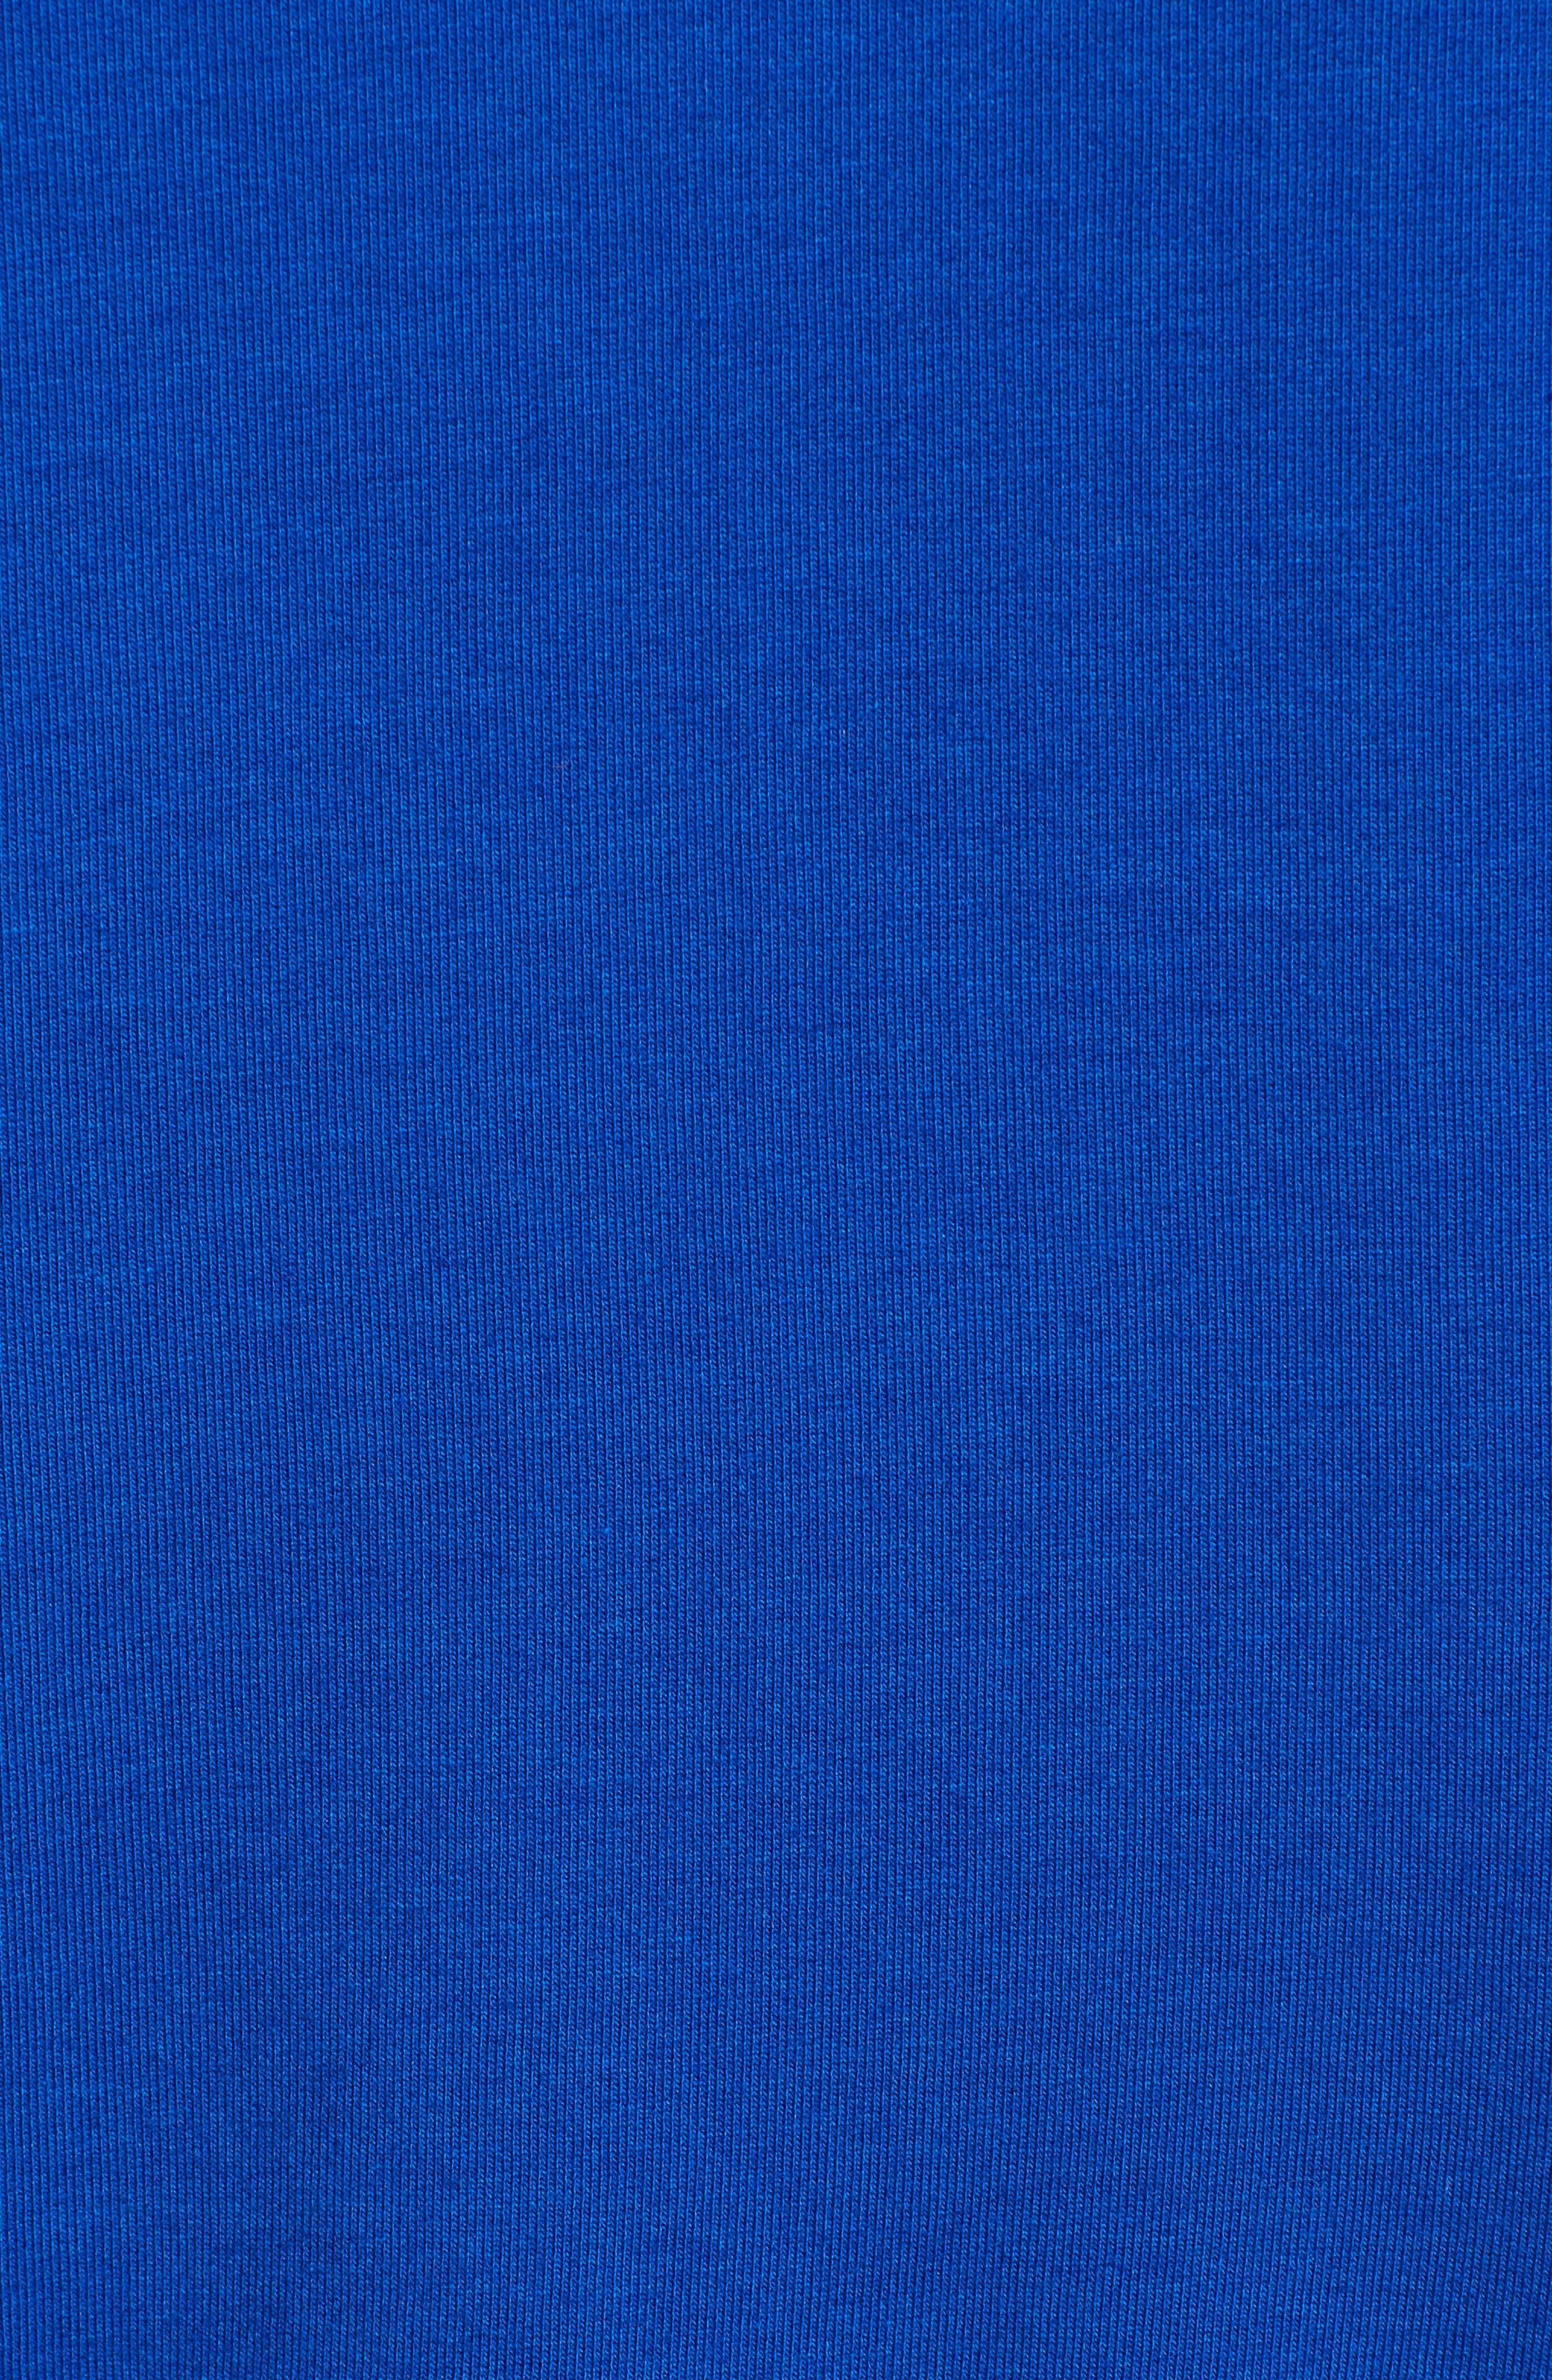 Ruffle Detail Sweatshirt,                             Alternate thumbnail 5, color,                             Blue Surf